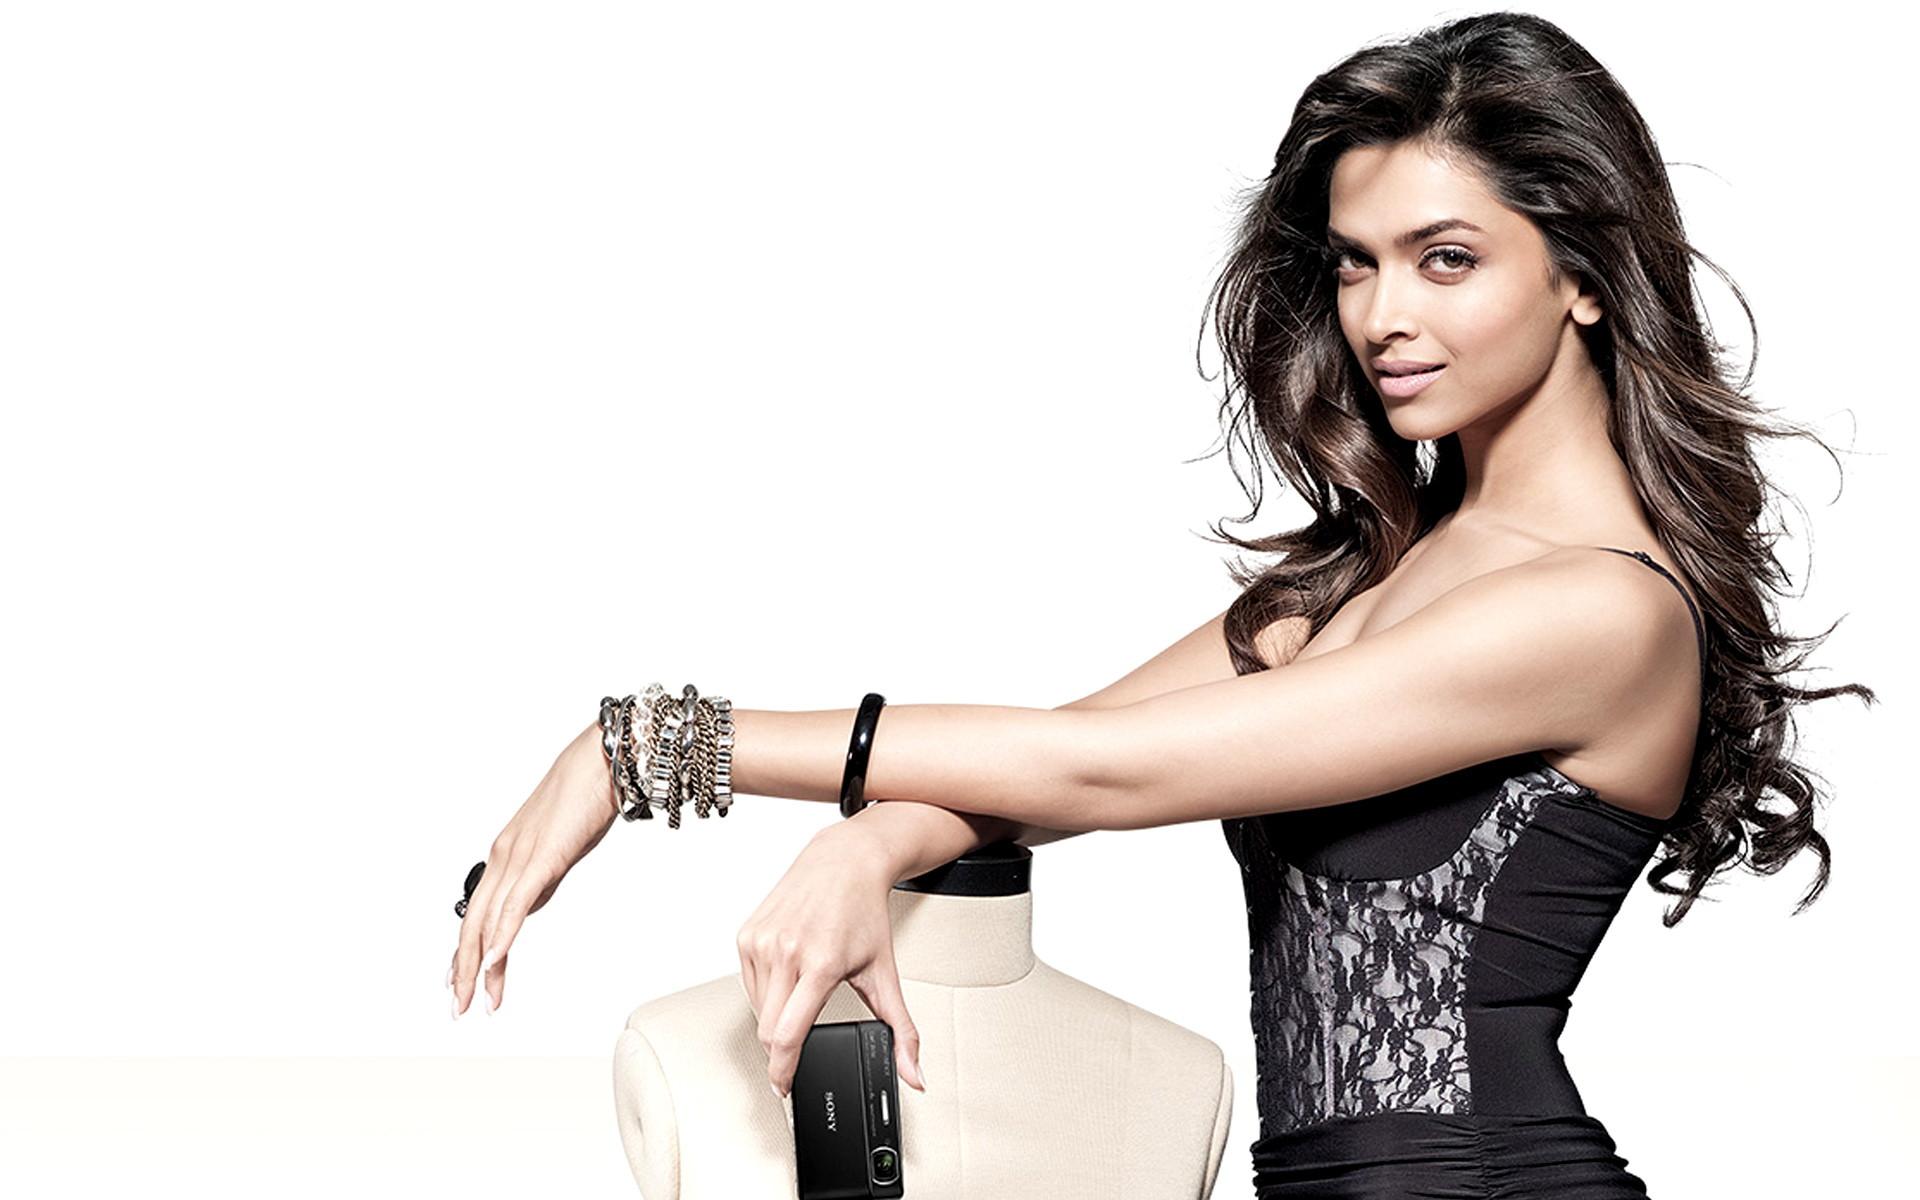 Deepika Padukone Hot And Sexy Photos And Wallpapers